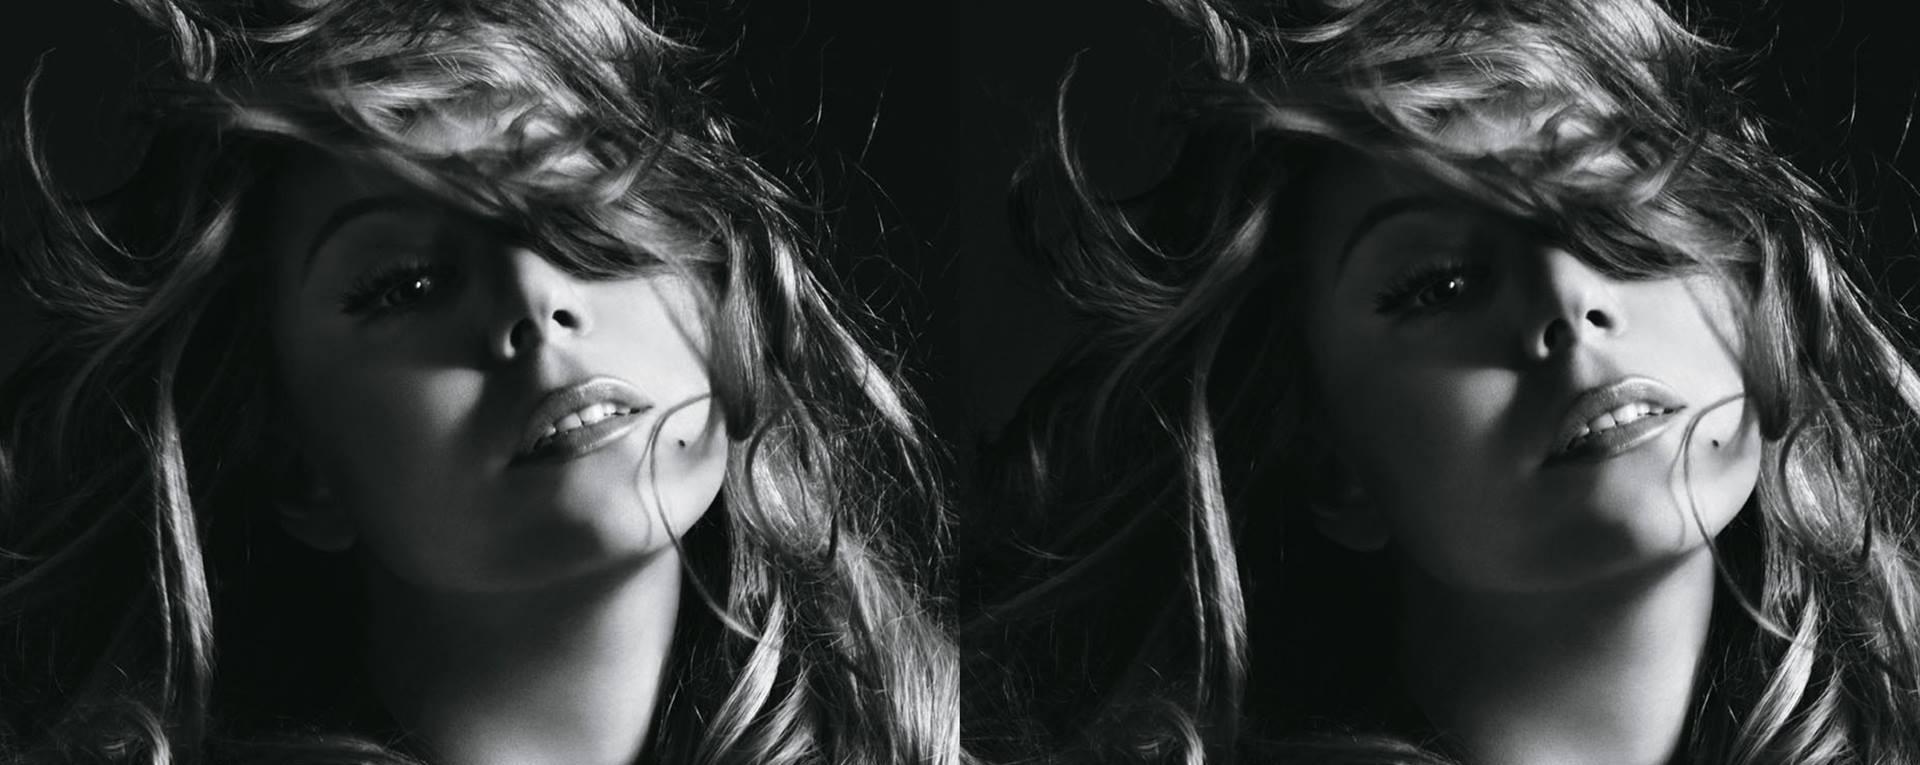 Mariah Carey 'Live in Concert' Singapore 2018